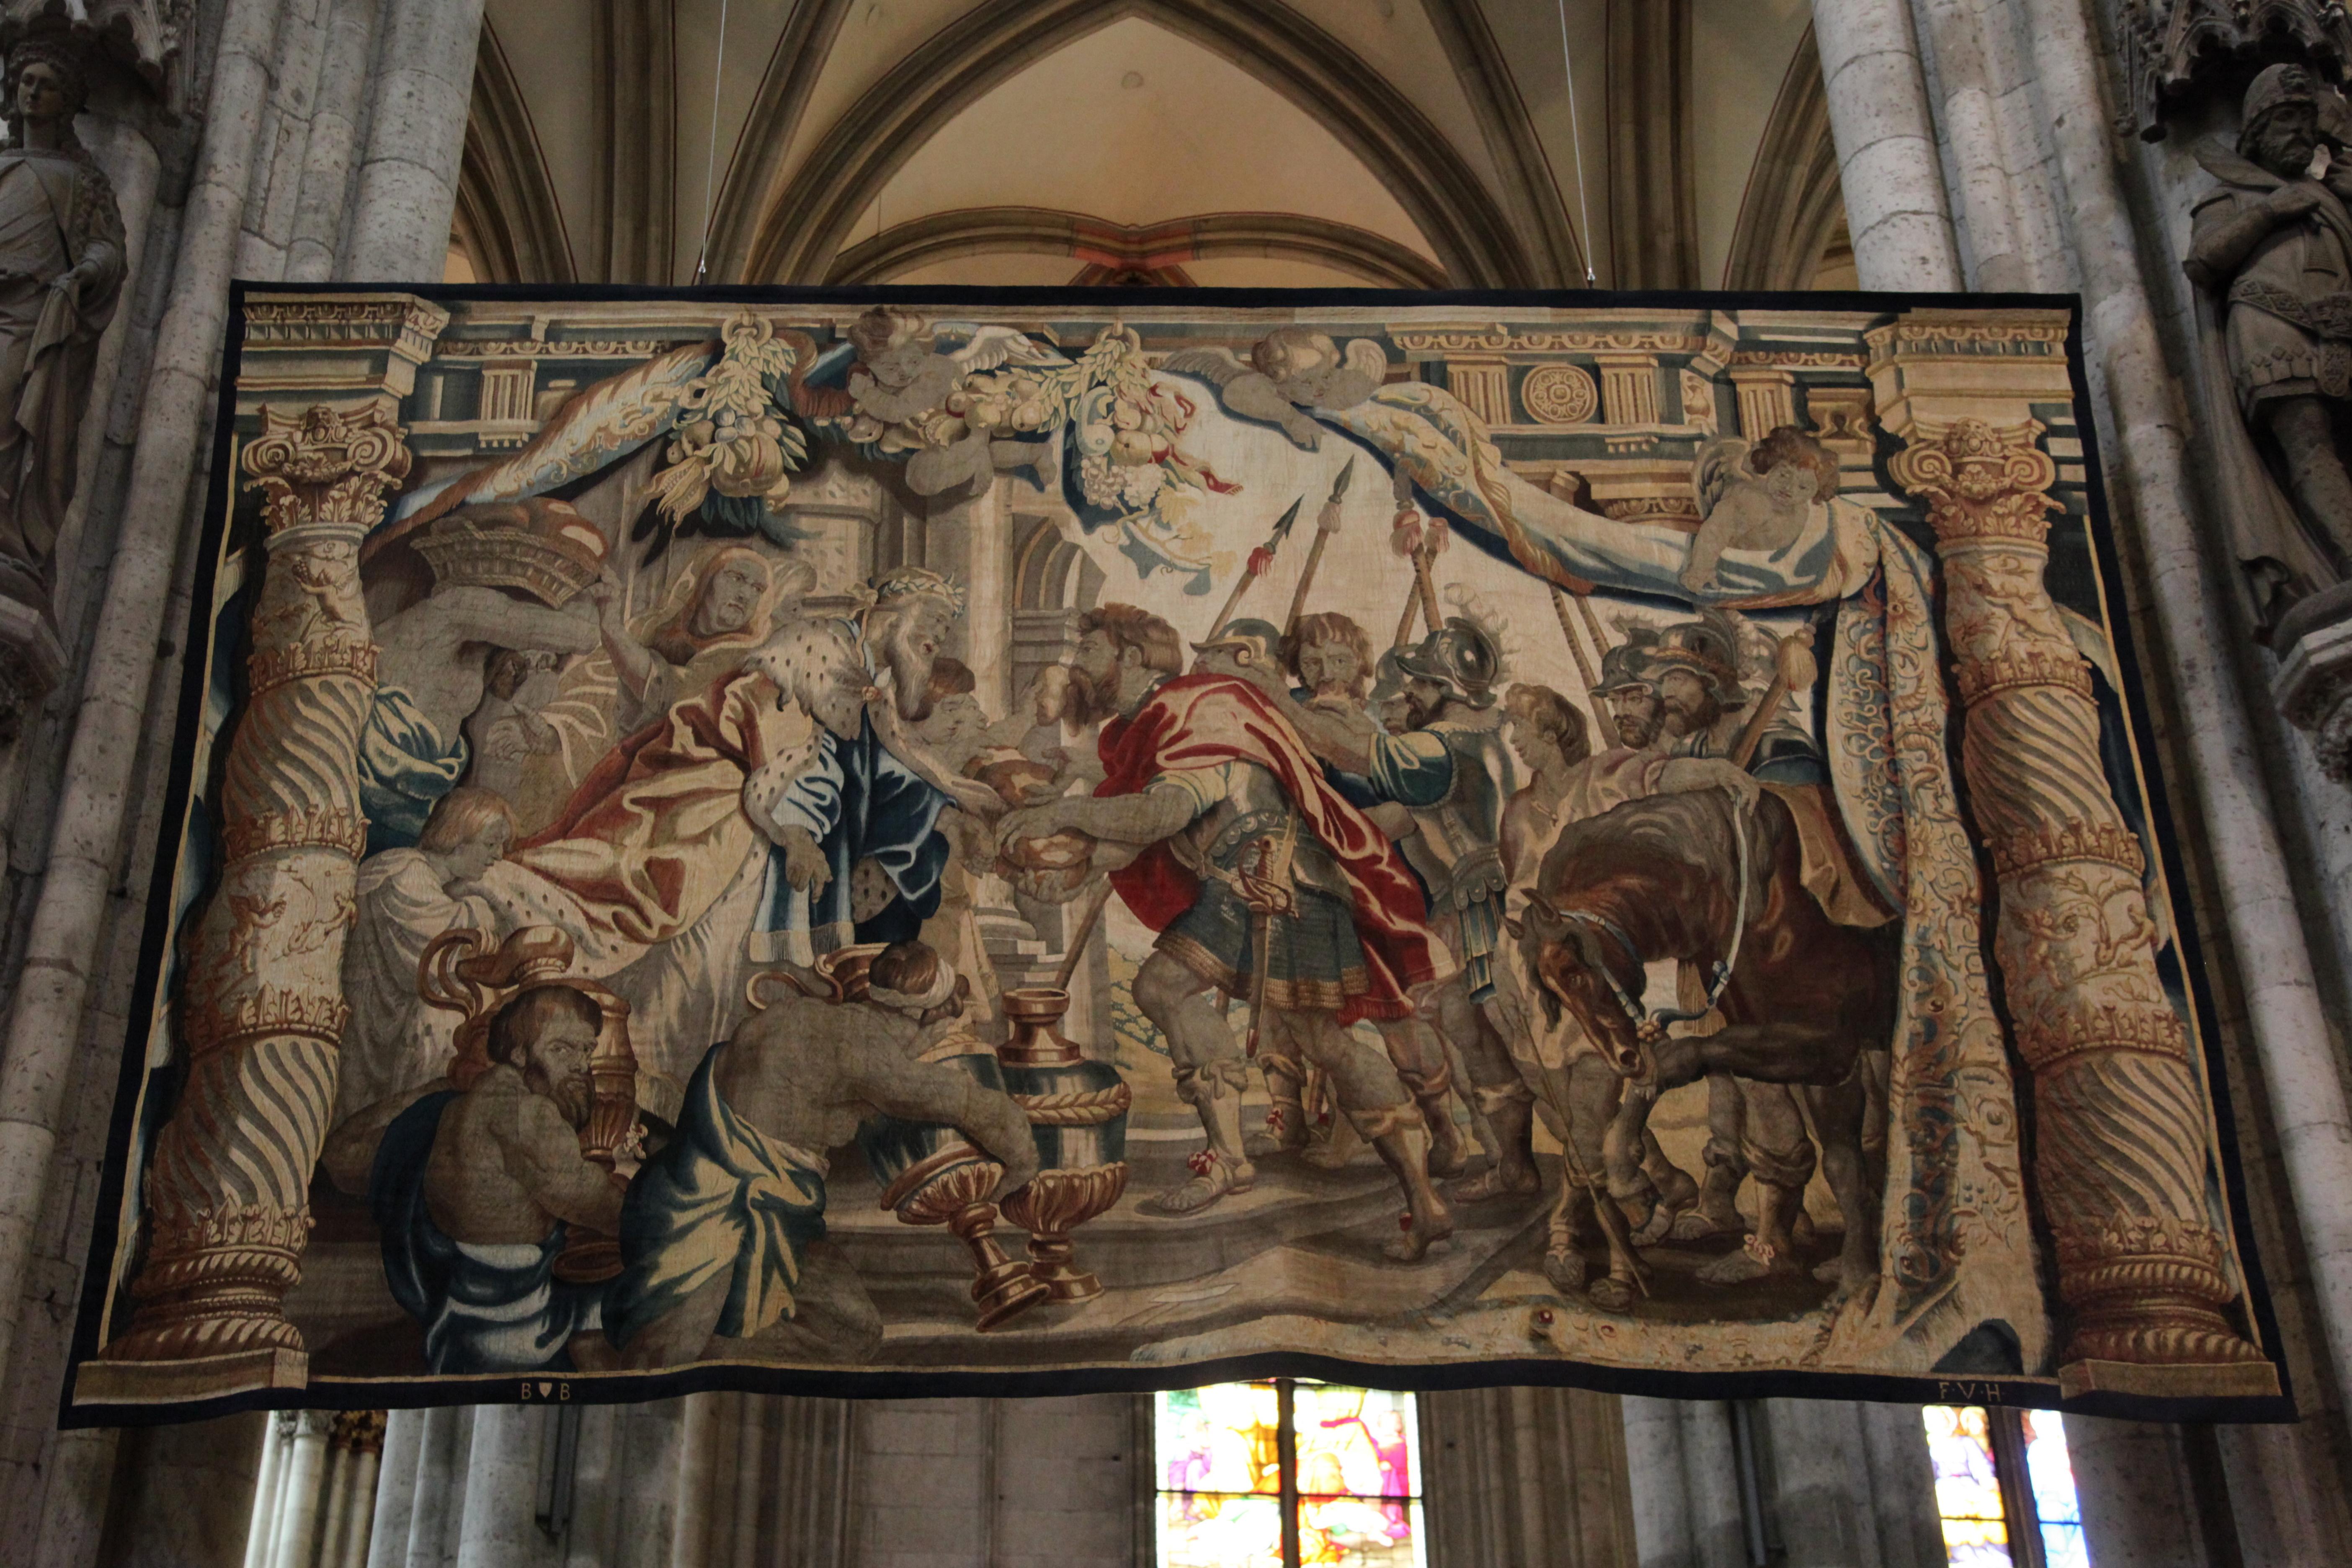 FileKöln  Dom  Teppich 11 iesjpg  Wikimedia Commo